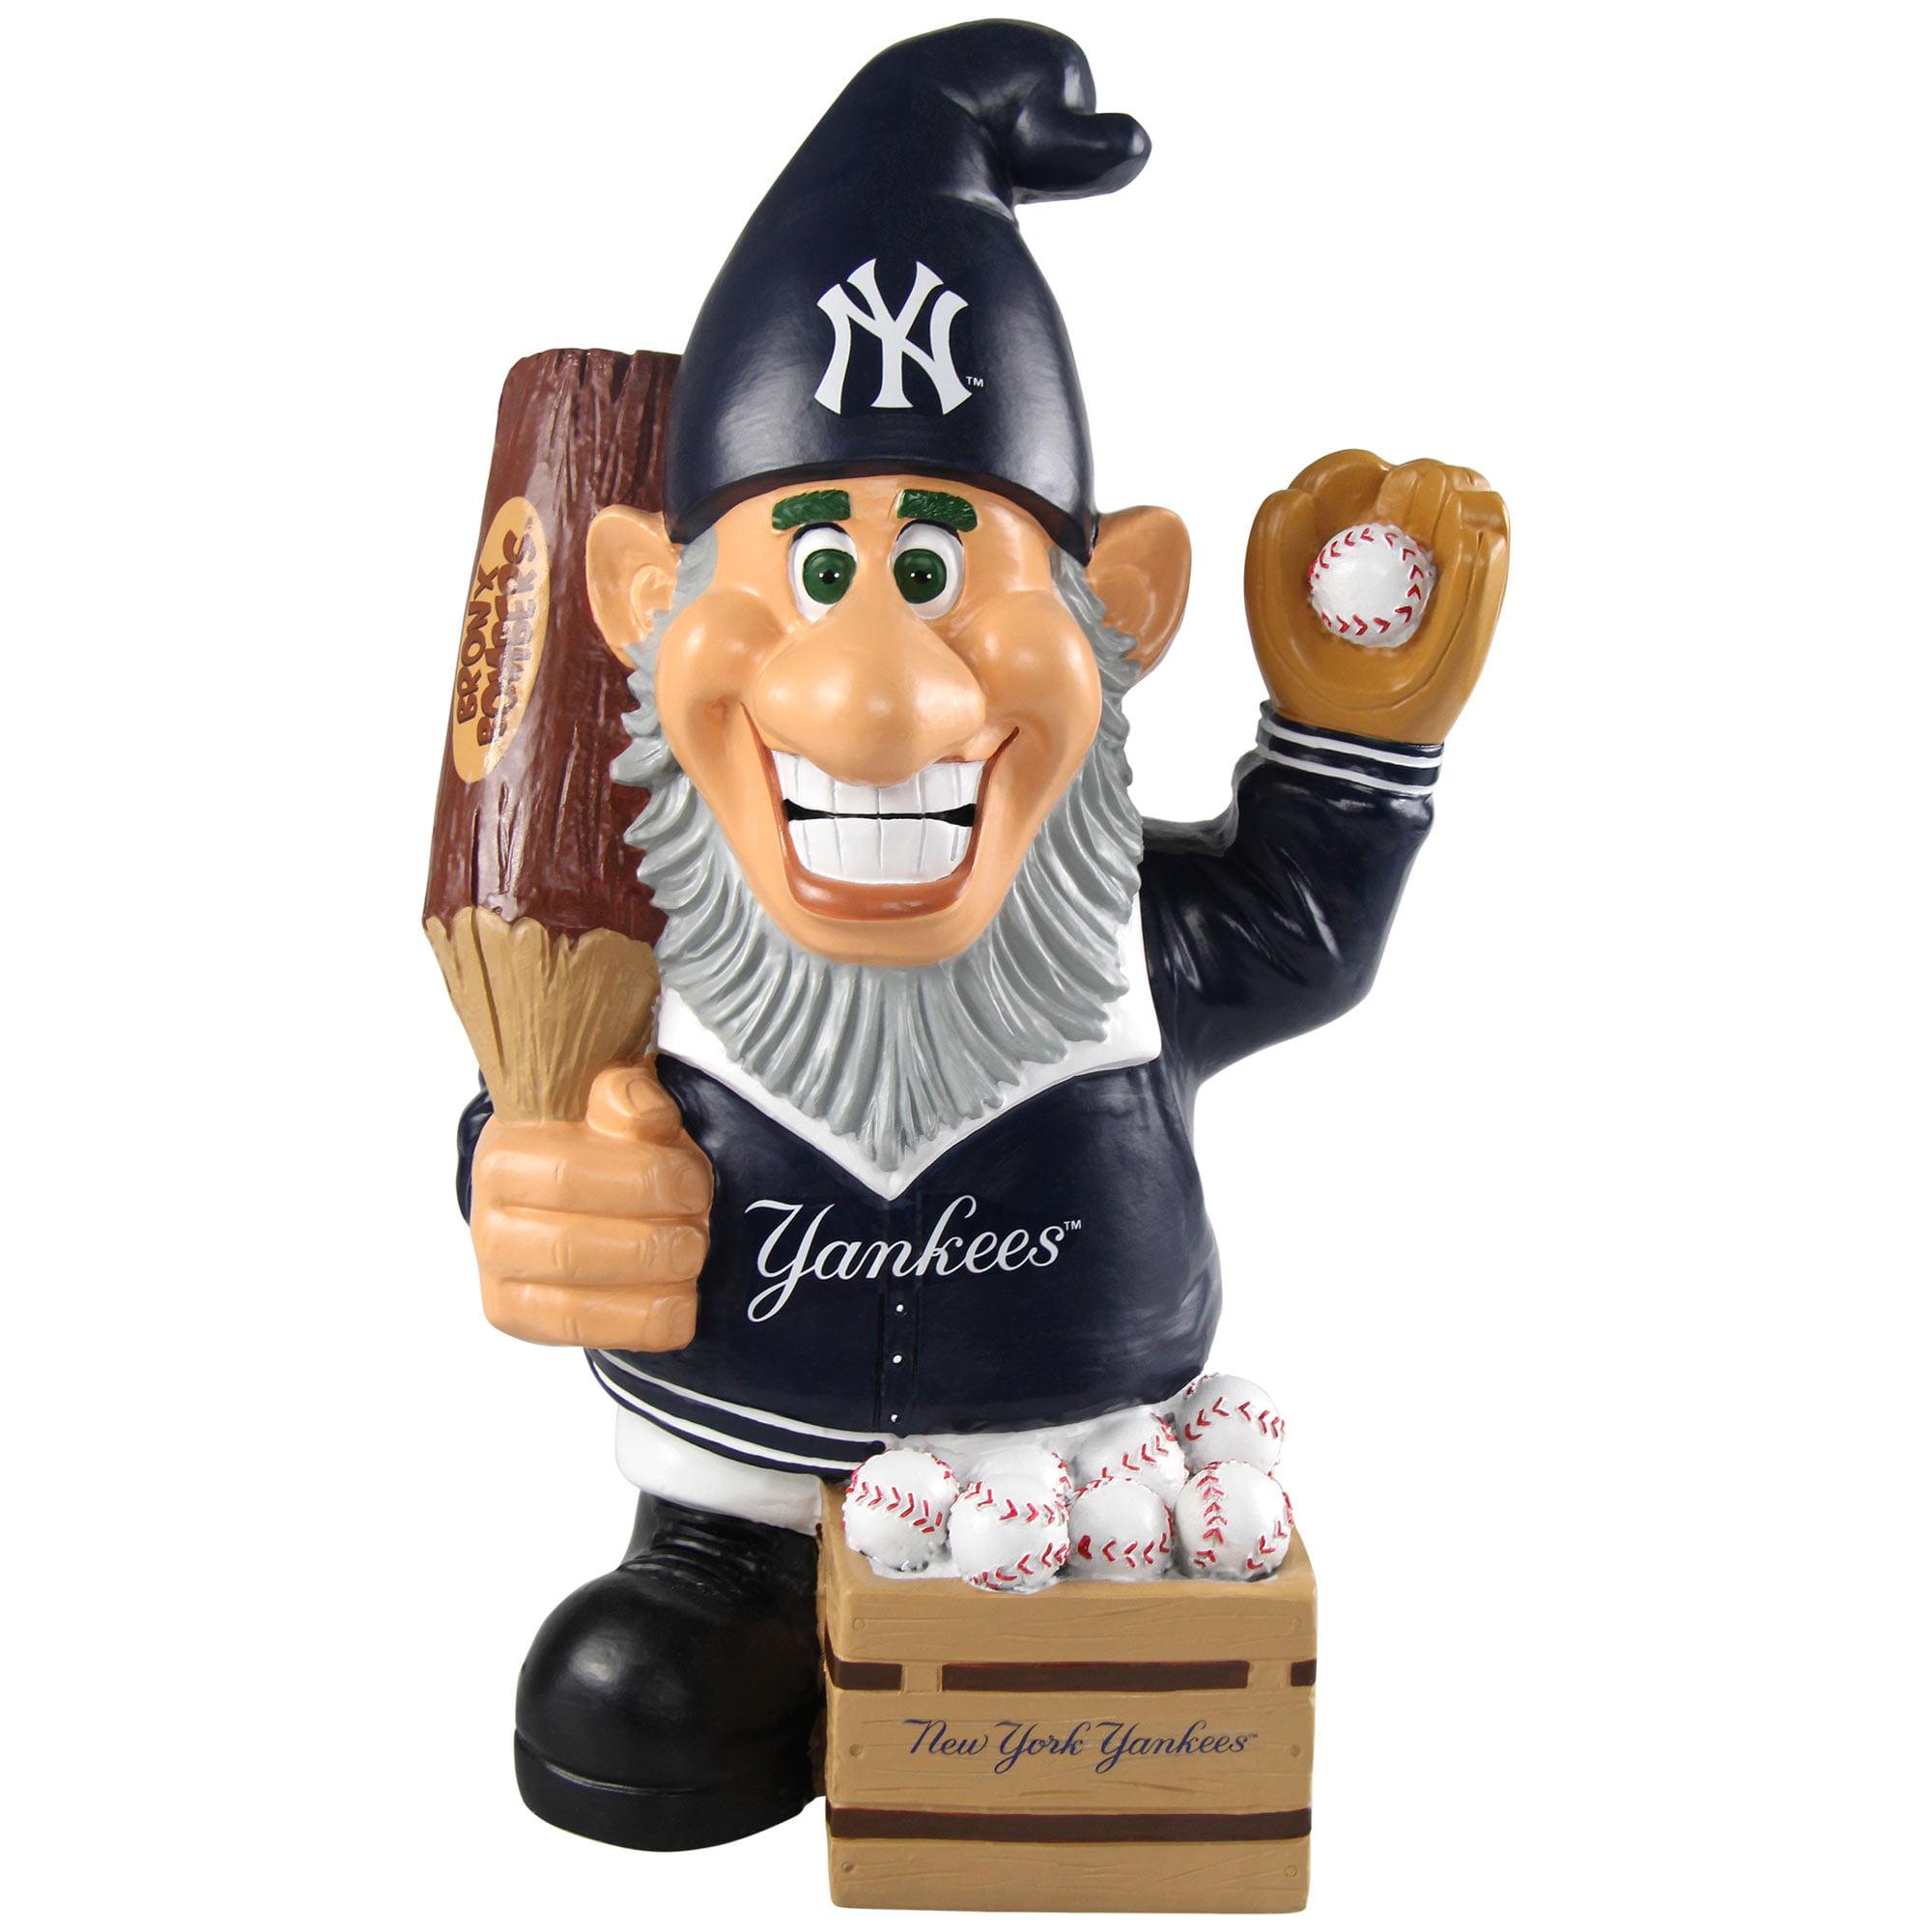 New York Yankees Caricature Decorative Gnome - No Size